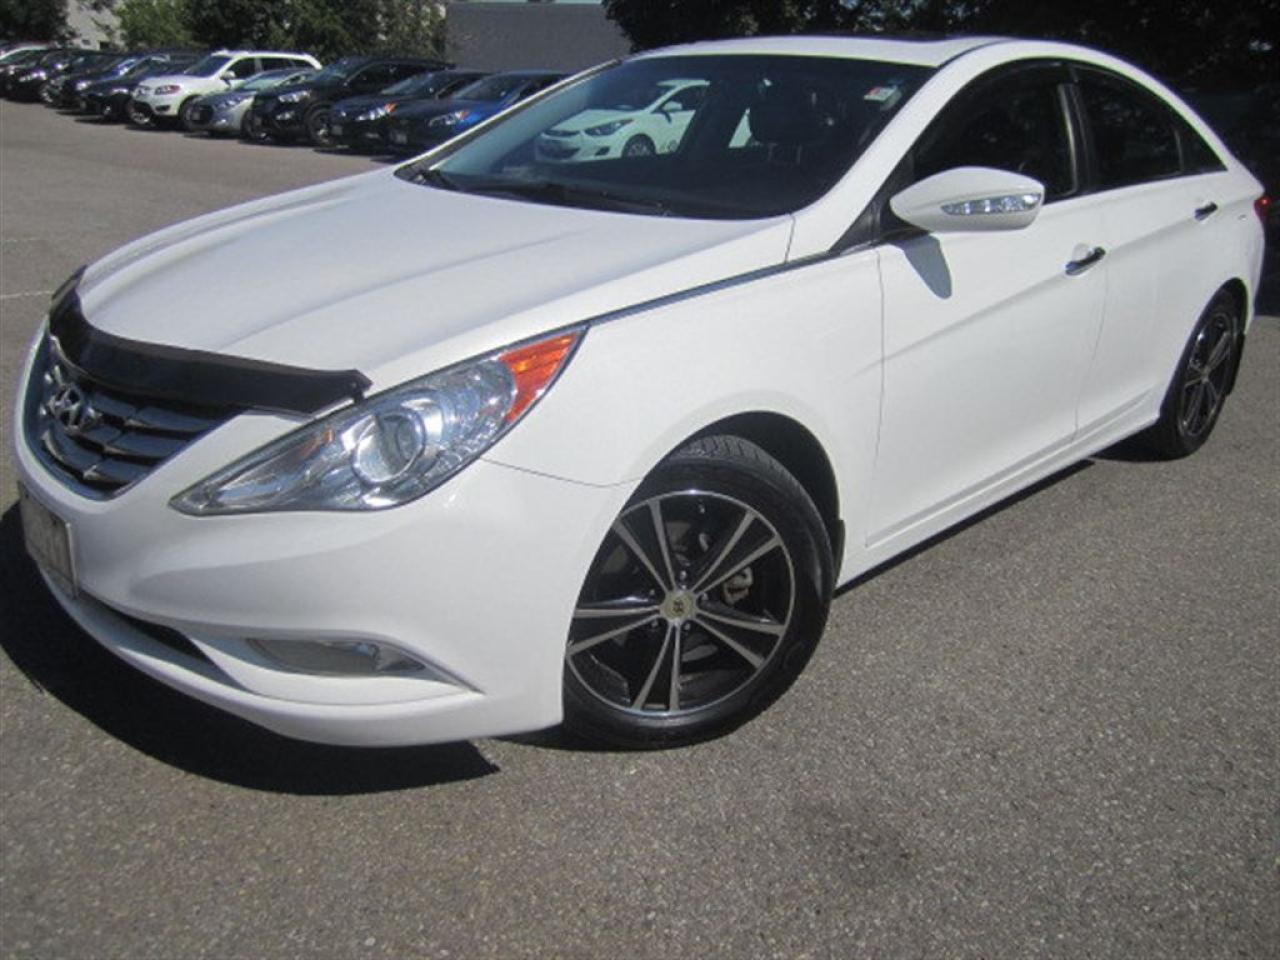 Photo of White 2011 Hyundai Sonata